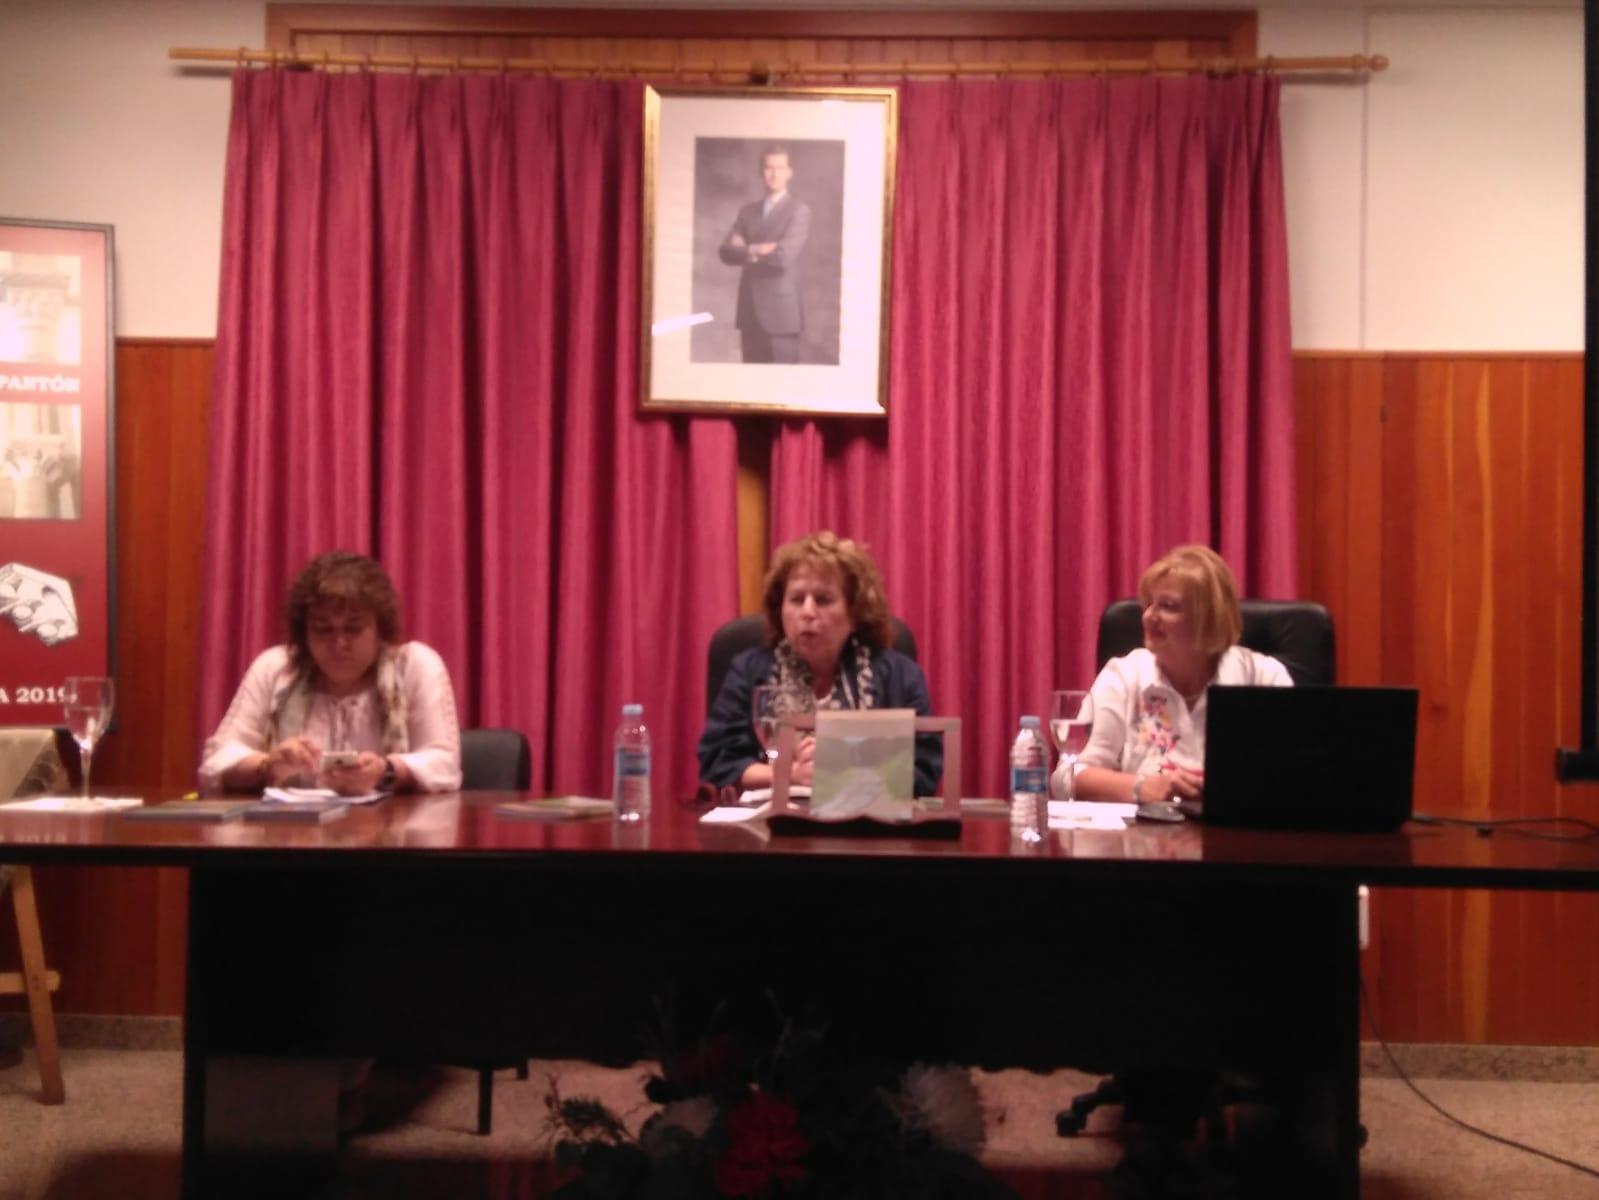 Presentación del Anuario en Ferreira de Pantón